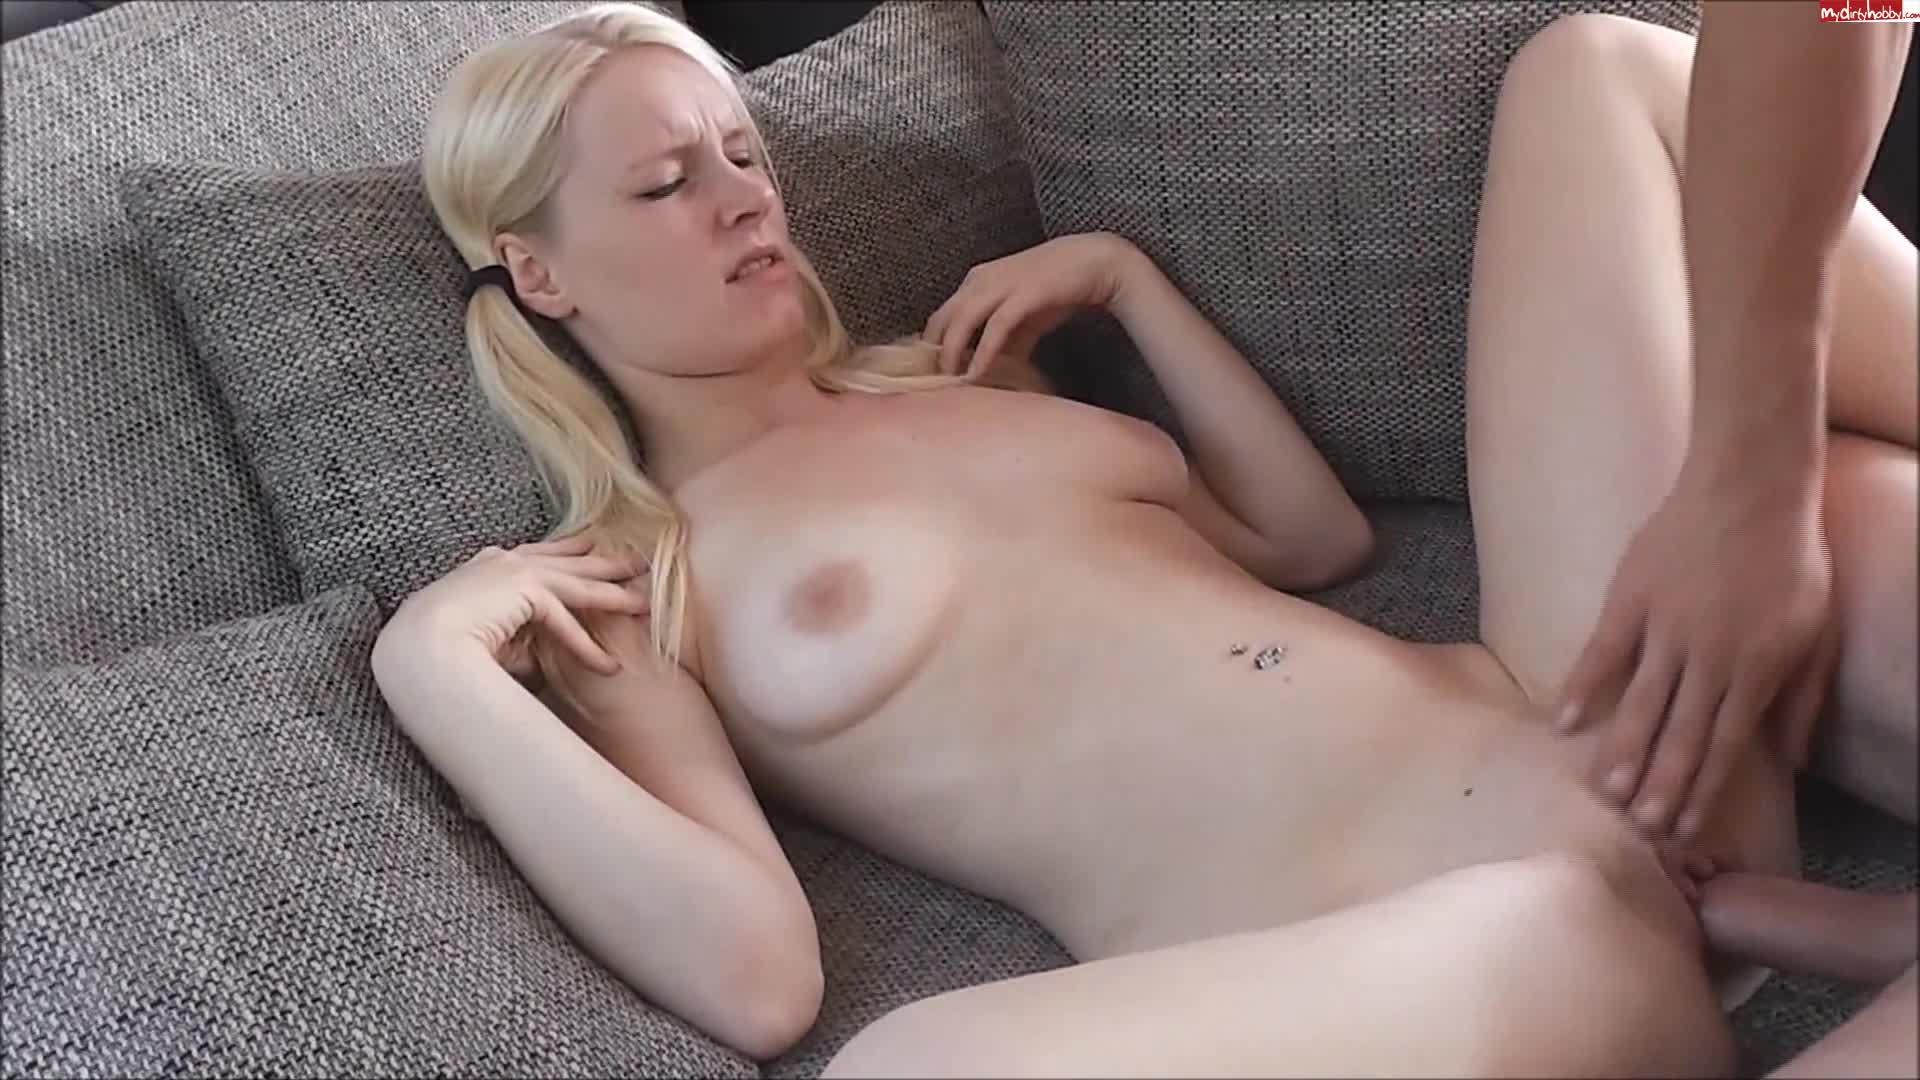 pussy wet remix xxx vedio